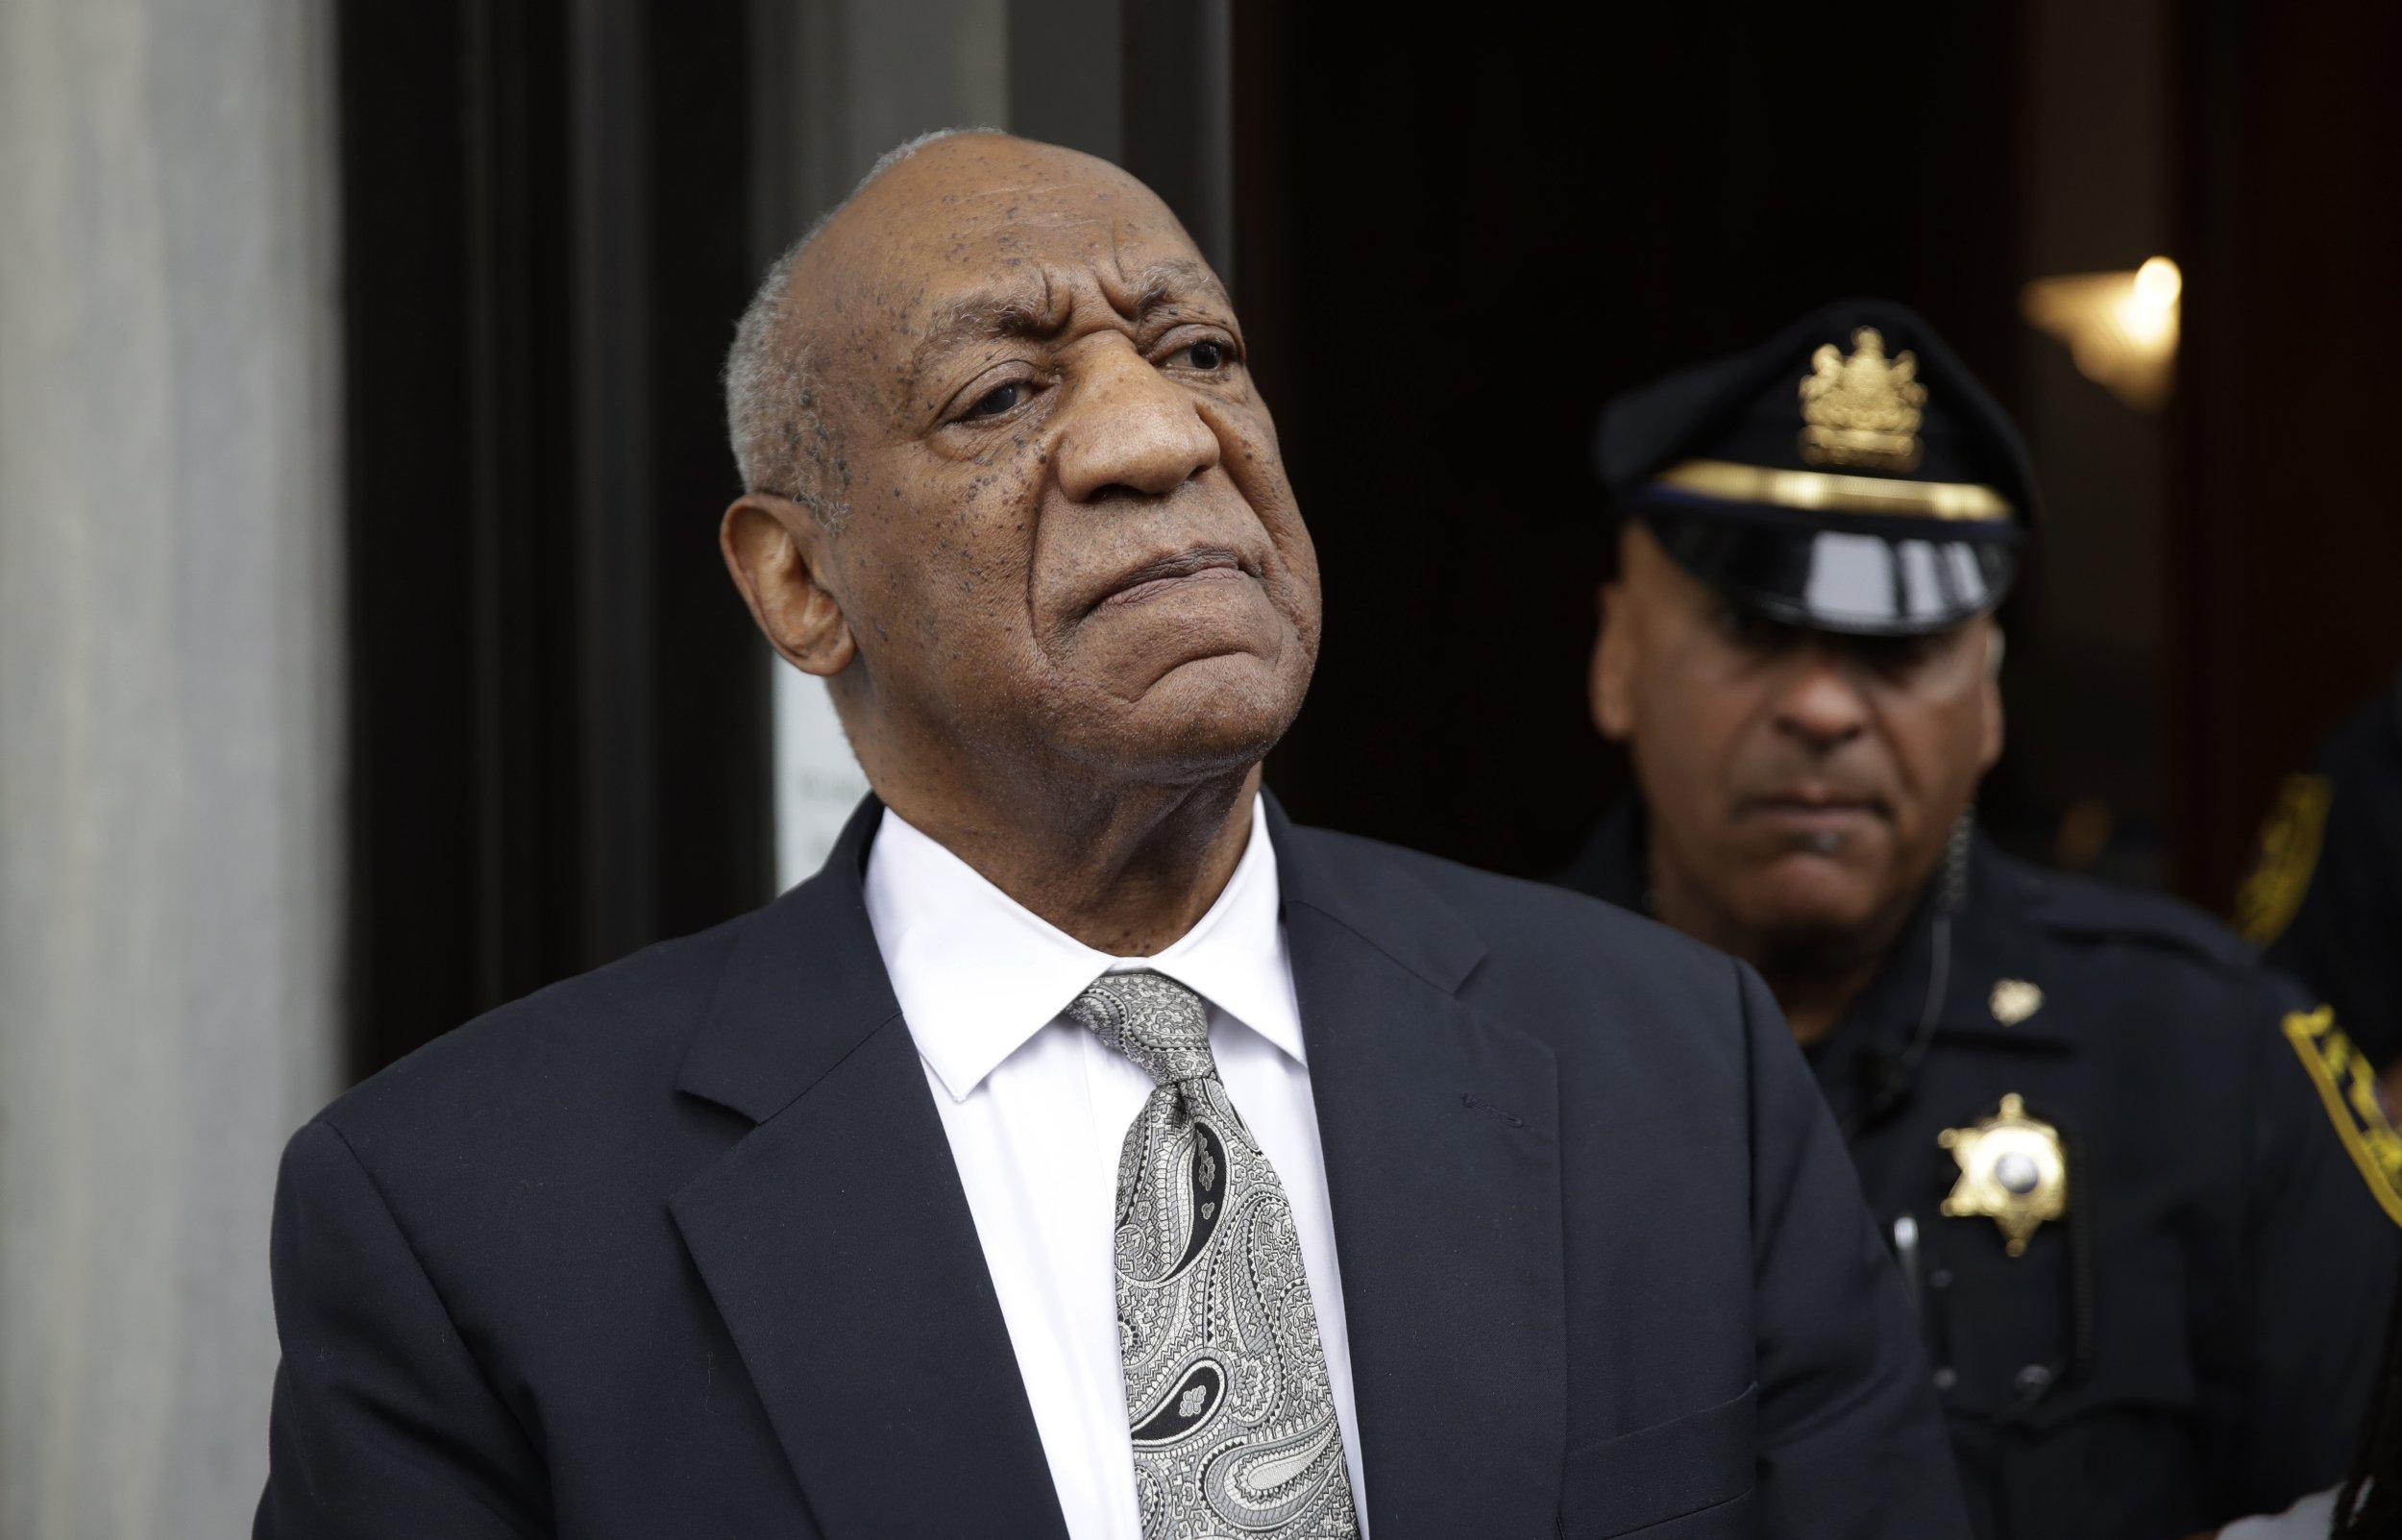 Bill Cosby's daughter Ensa dies at 44 as he awaits retrial in sex assault case